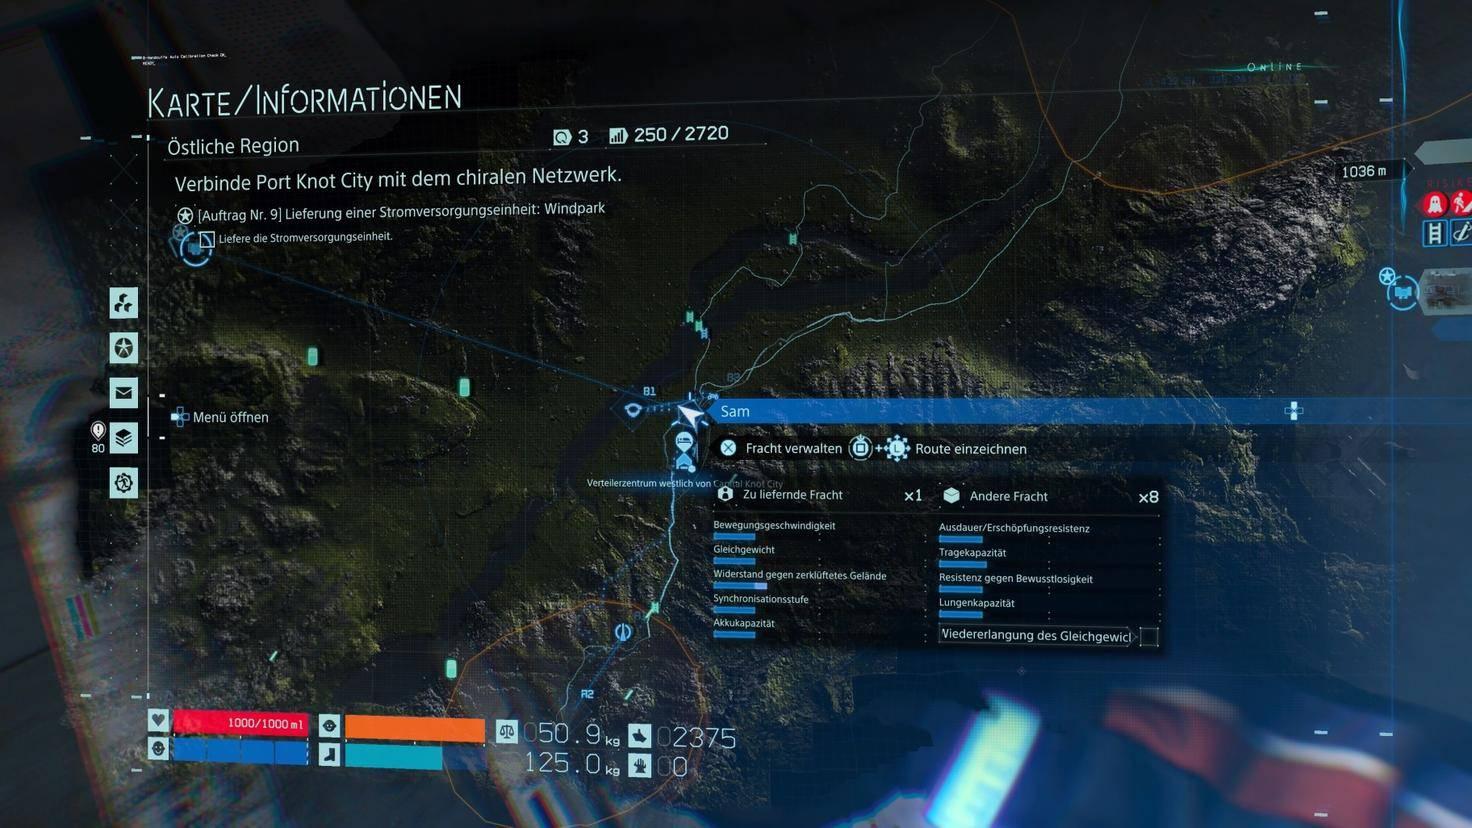 death-stranding-map-karte-screenshot